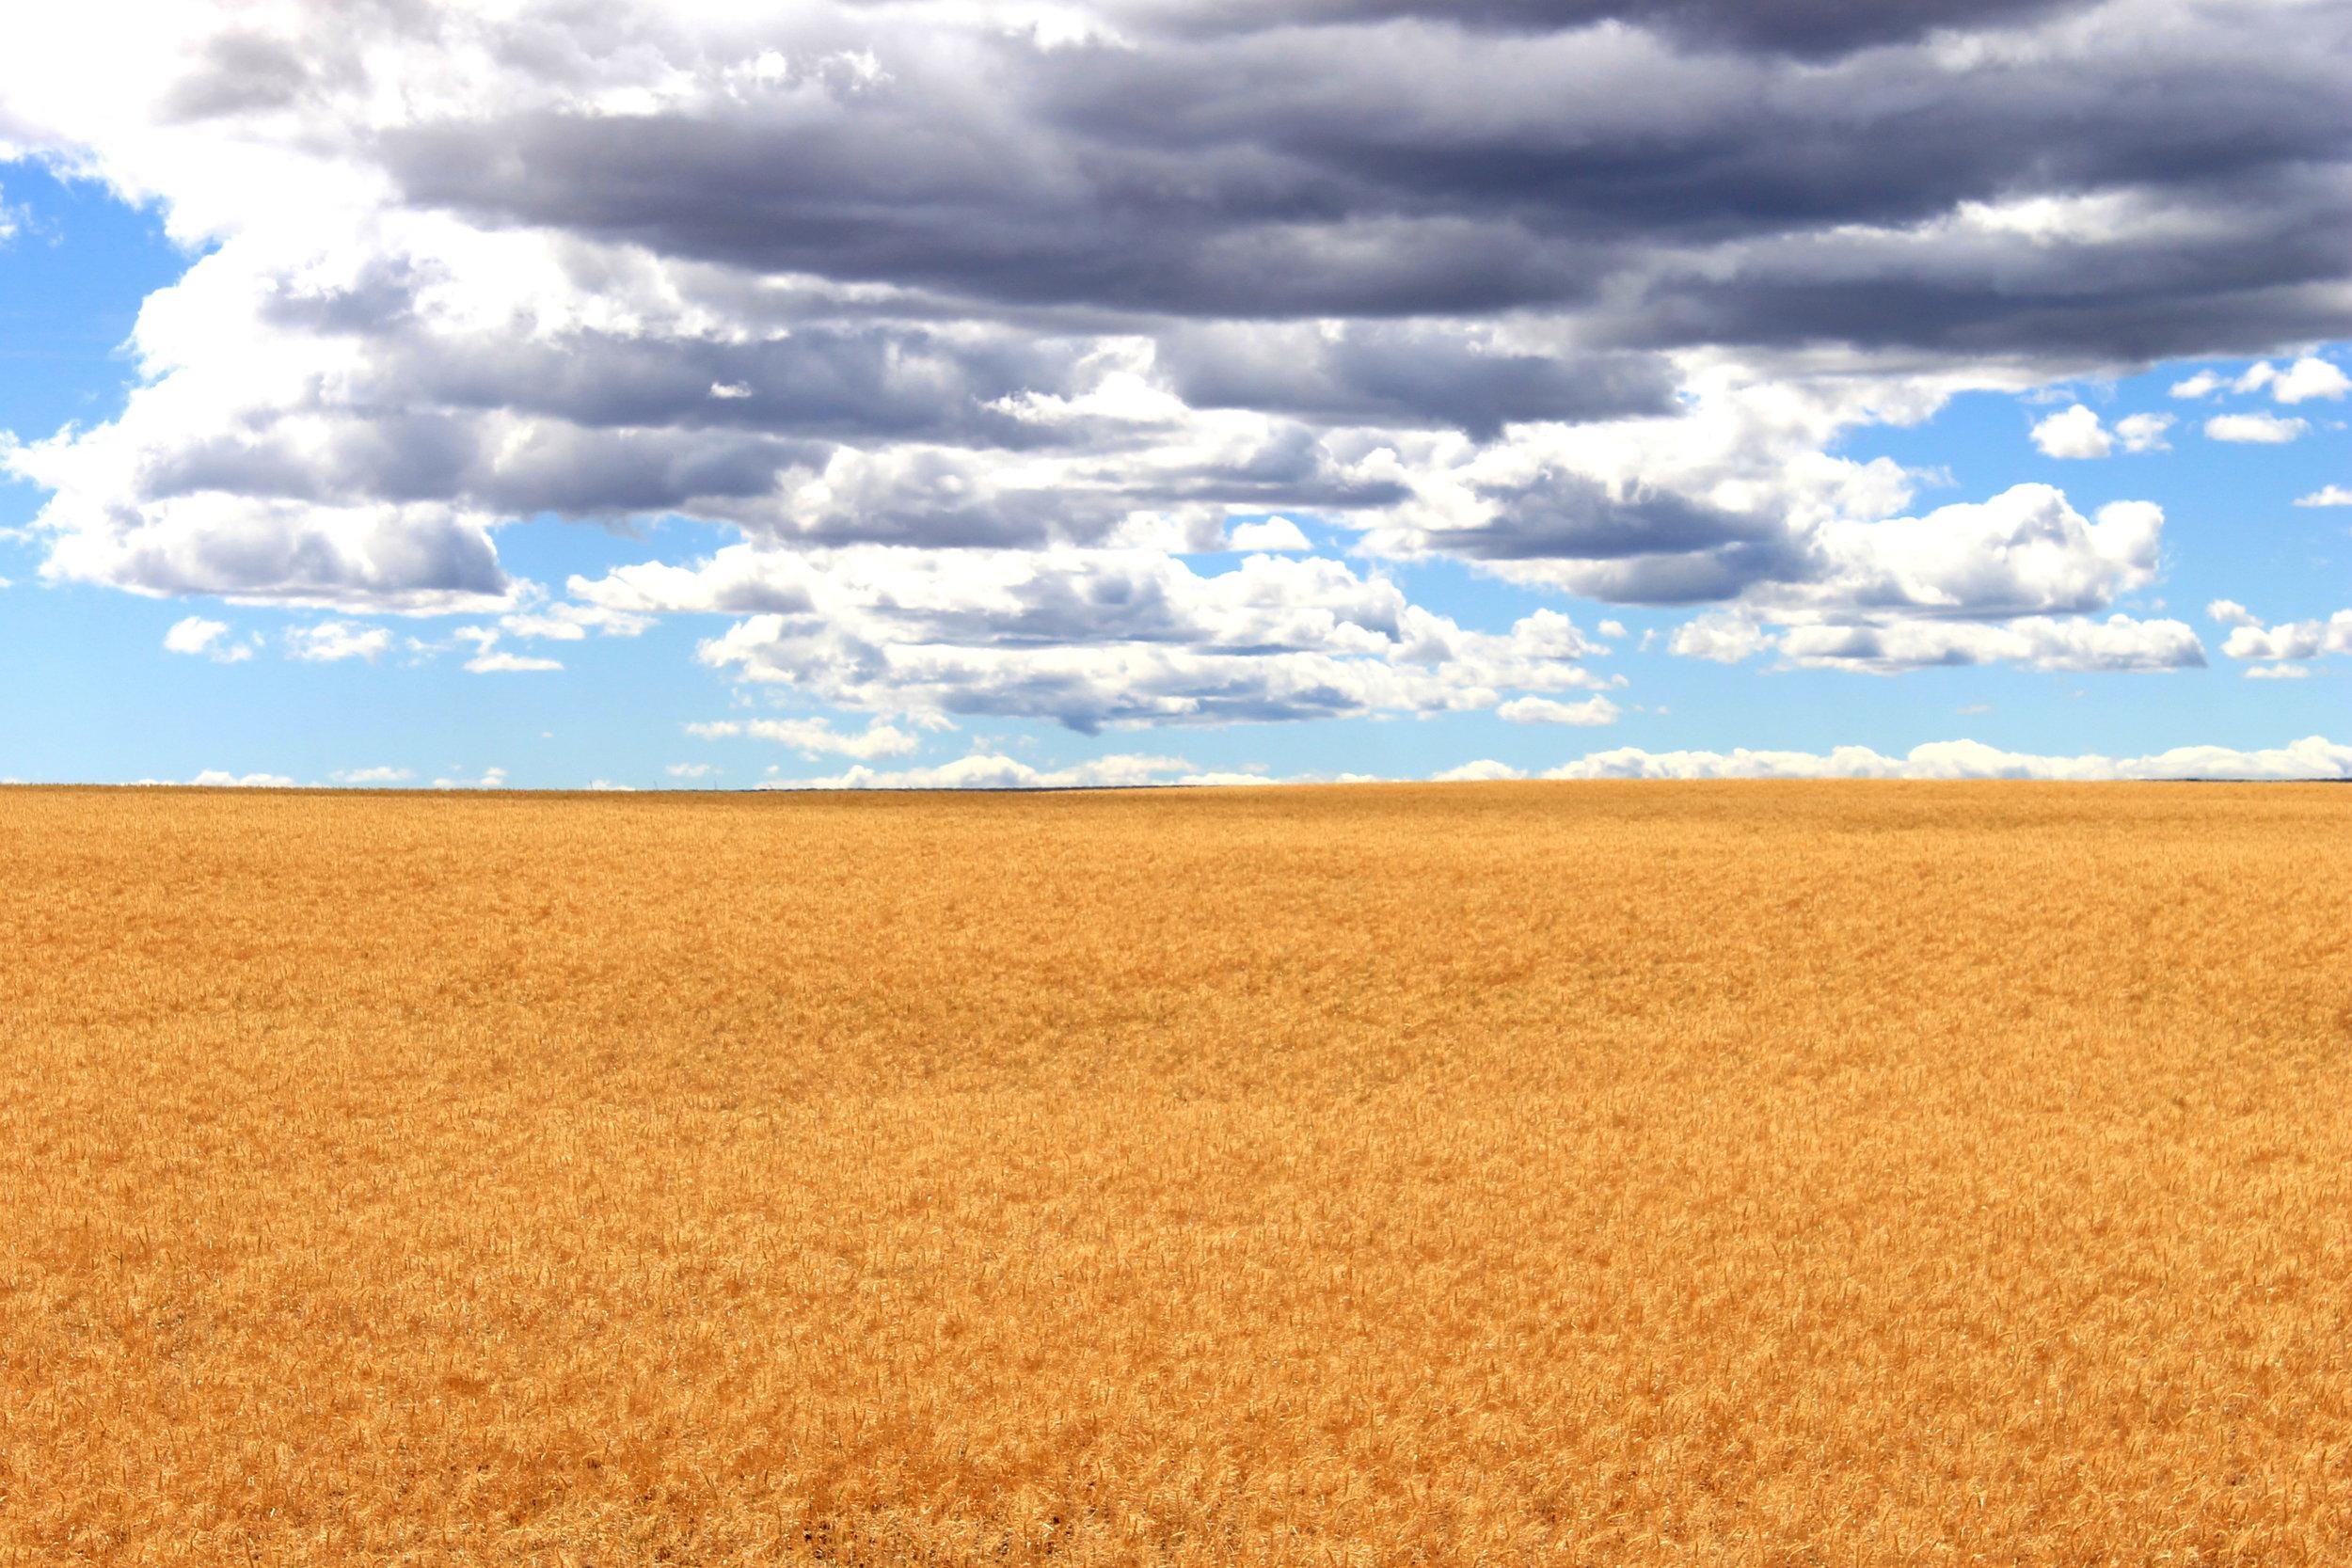 7 JUL 2014-06-29 Wheat field near Mabton.jpg